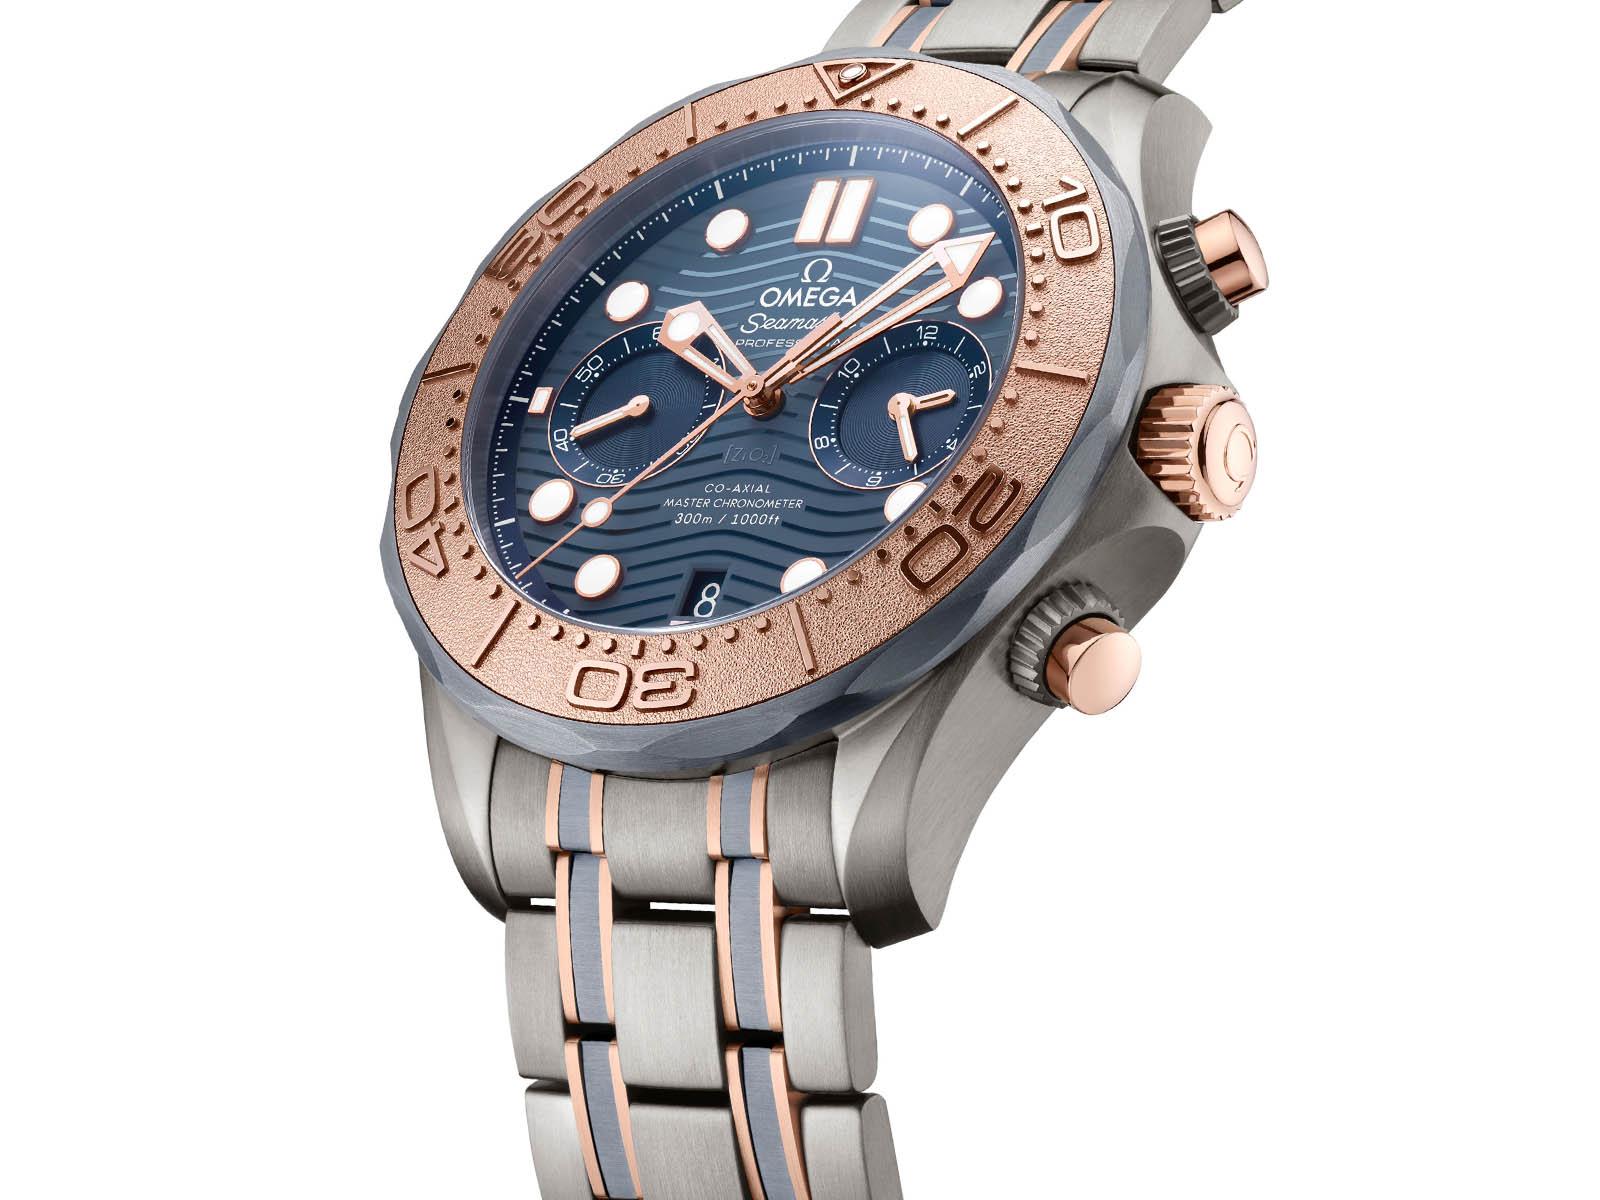 omega-seamaster-diver-300m-chronograph-gold-titanium-tantalum-6.jpg